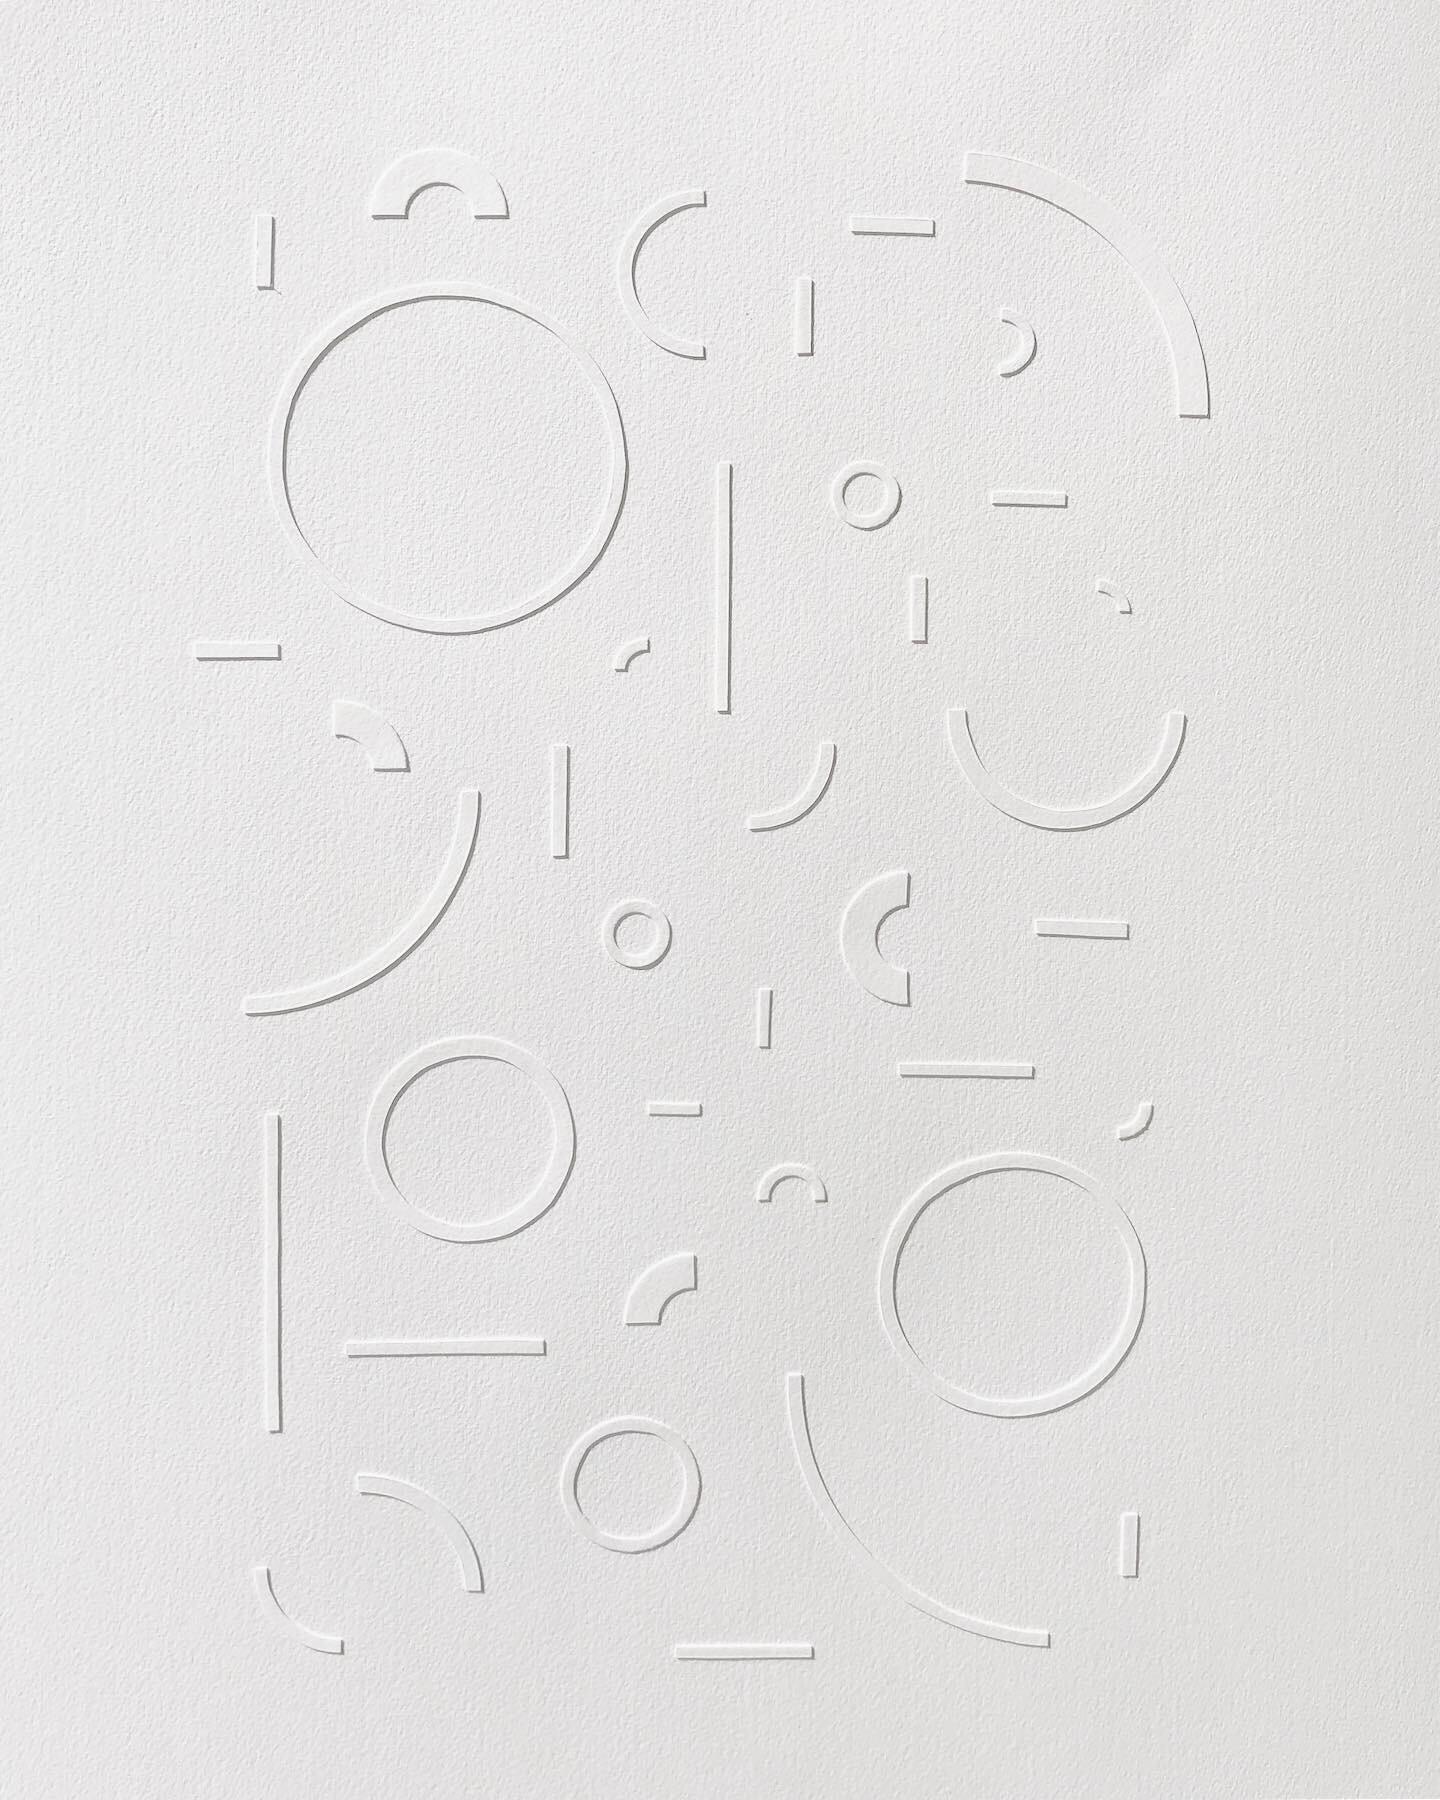 Homage to Josef Albers